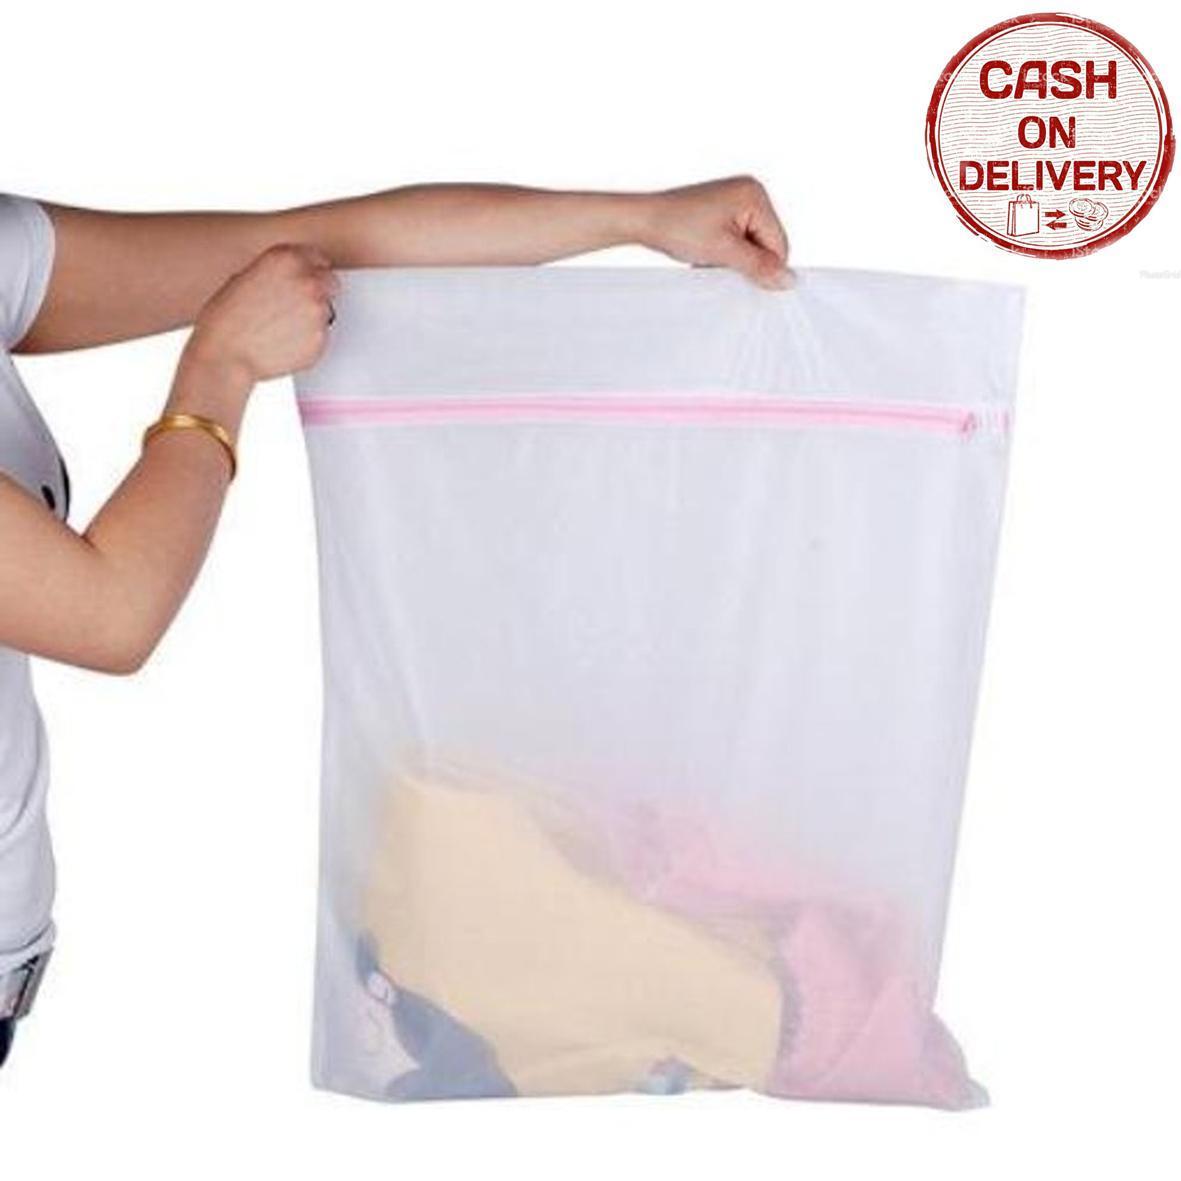 Kado Unik-- Bra Laundry Jaring Resleting Cucian Baju Kotor / Kantong Resleting / Tas